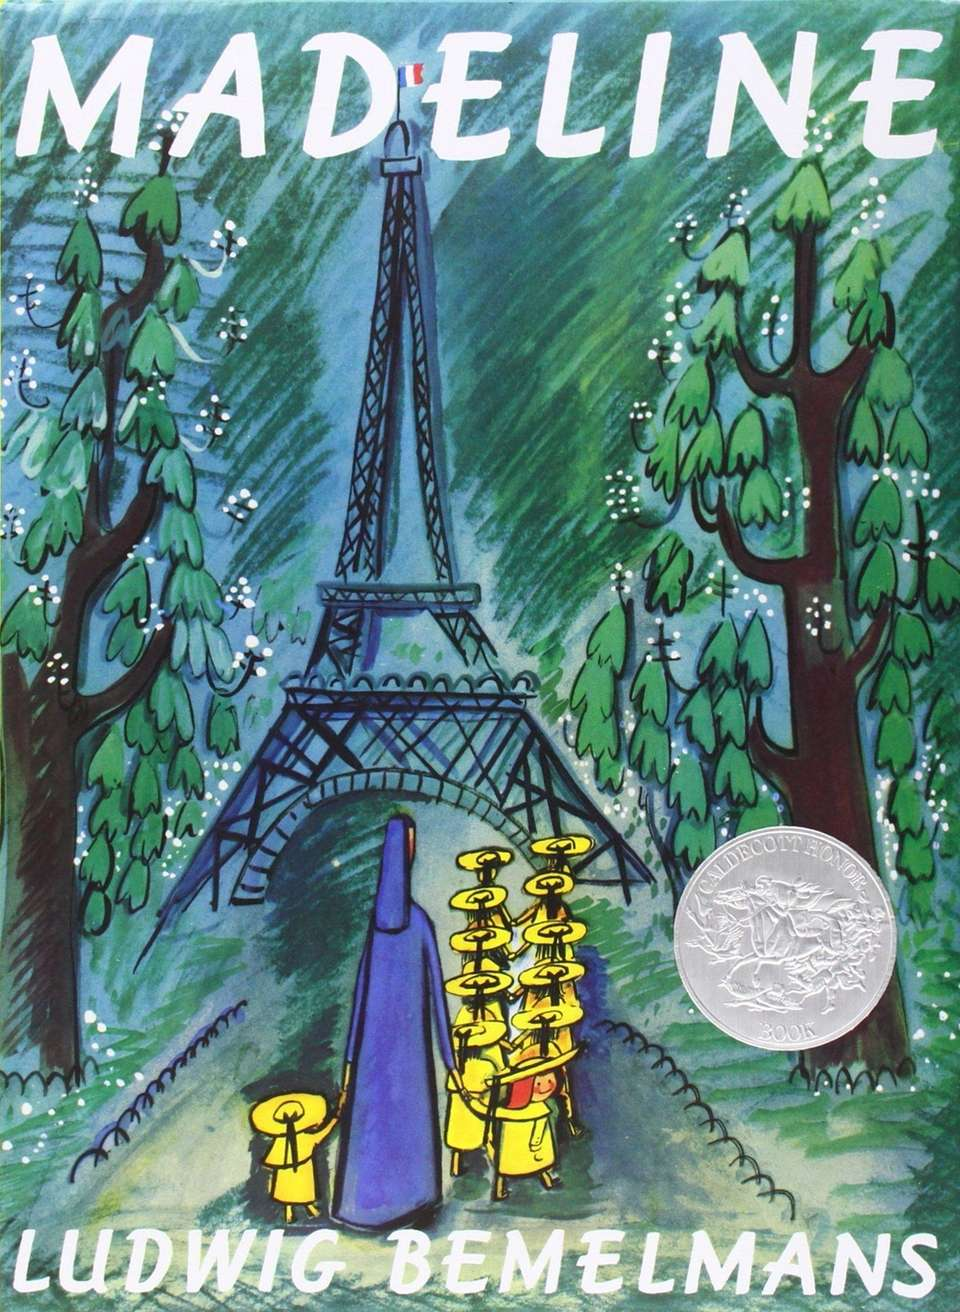 A classic 1939 tale of a pint-size Parisian